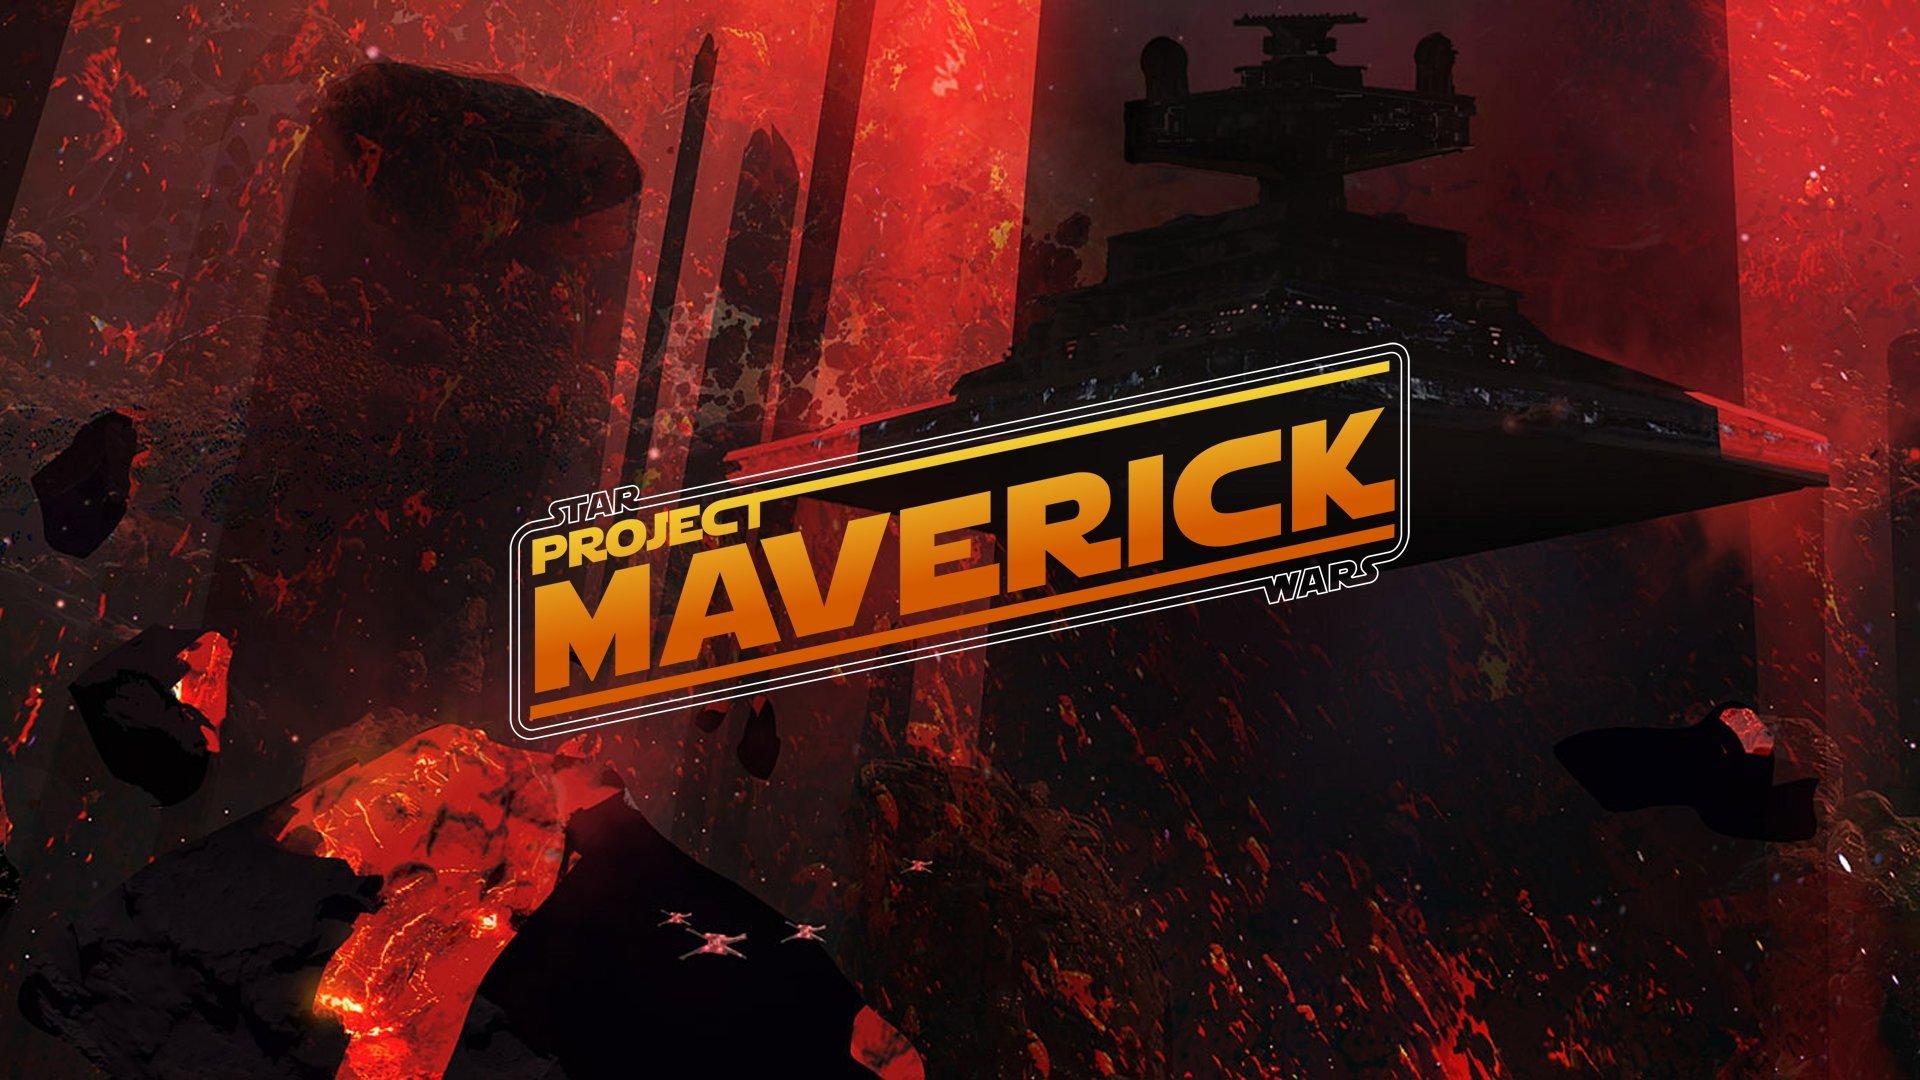 Star Wars Project Maverick leak